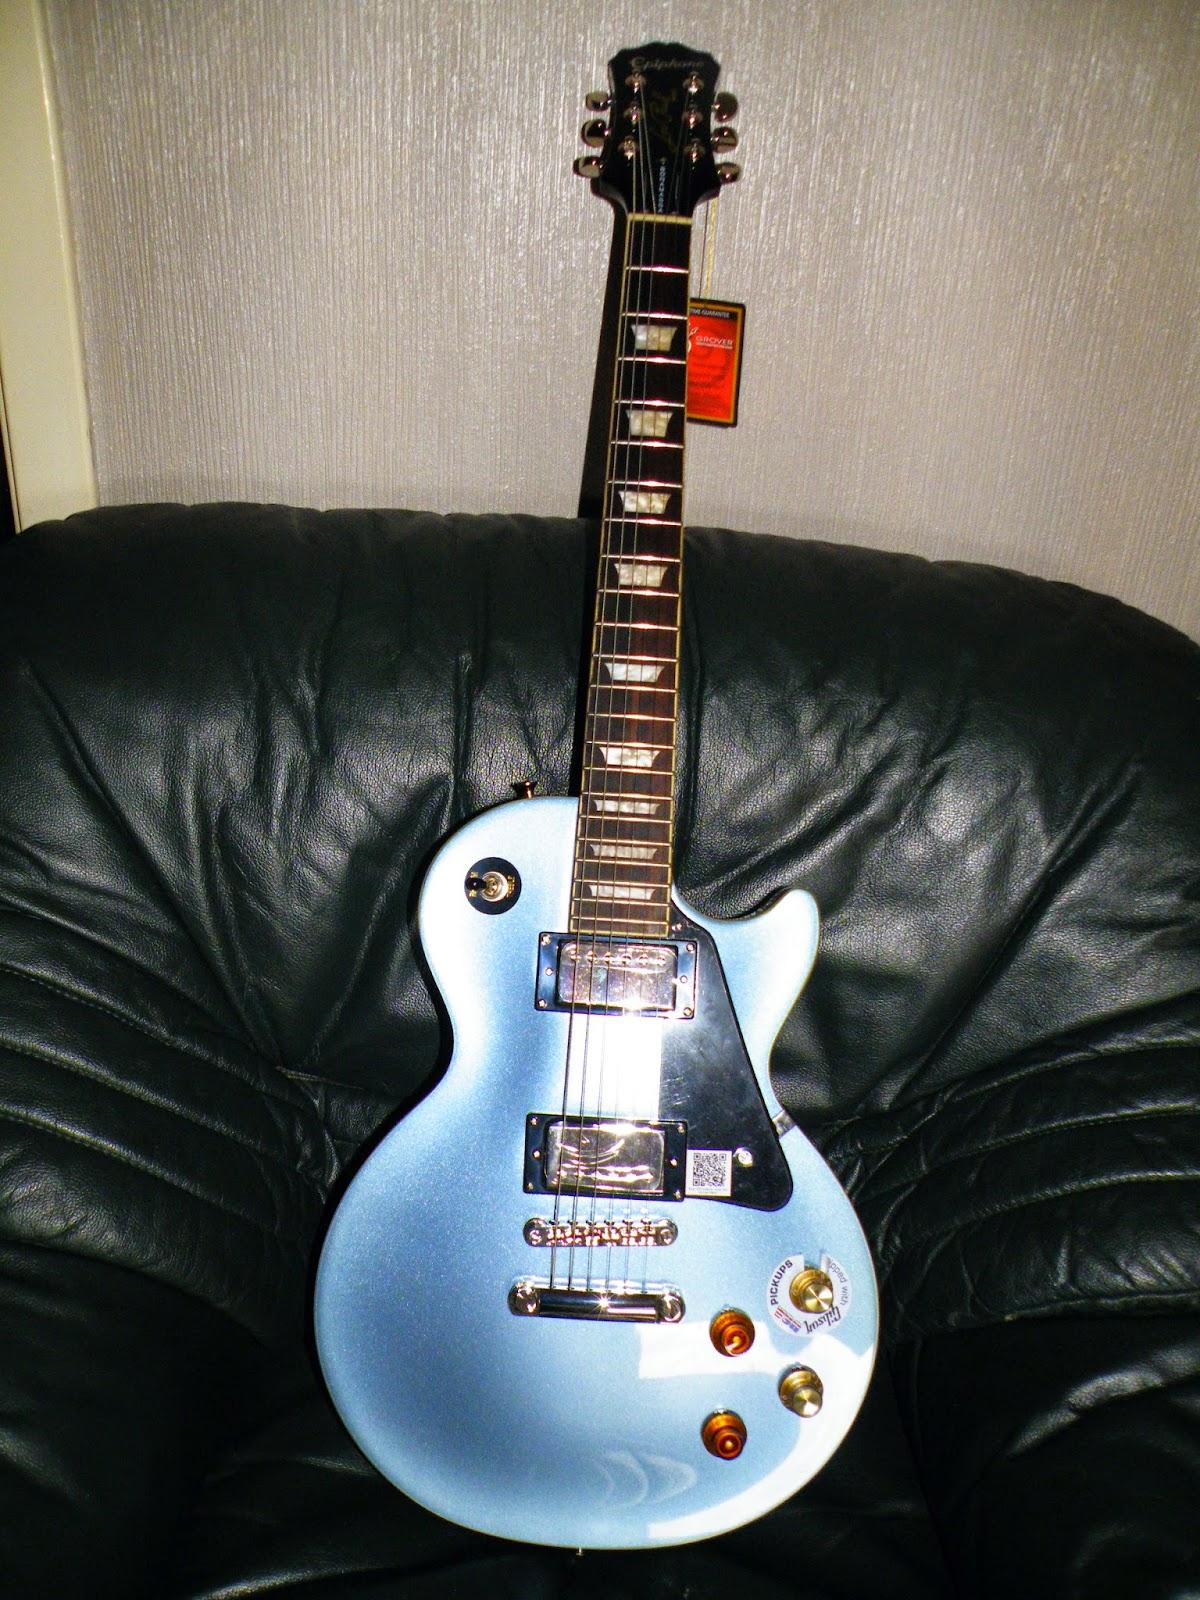 guitarra epiphone limited edition joe bonamassa les paul standard outfit pelham blue. Black Bedroom Furniture Sets. Home Design Ideas